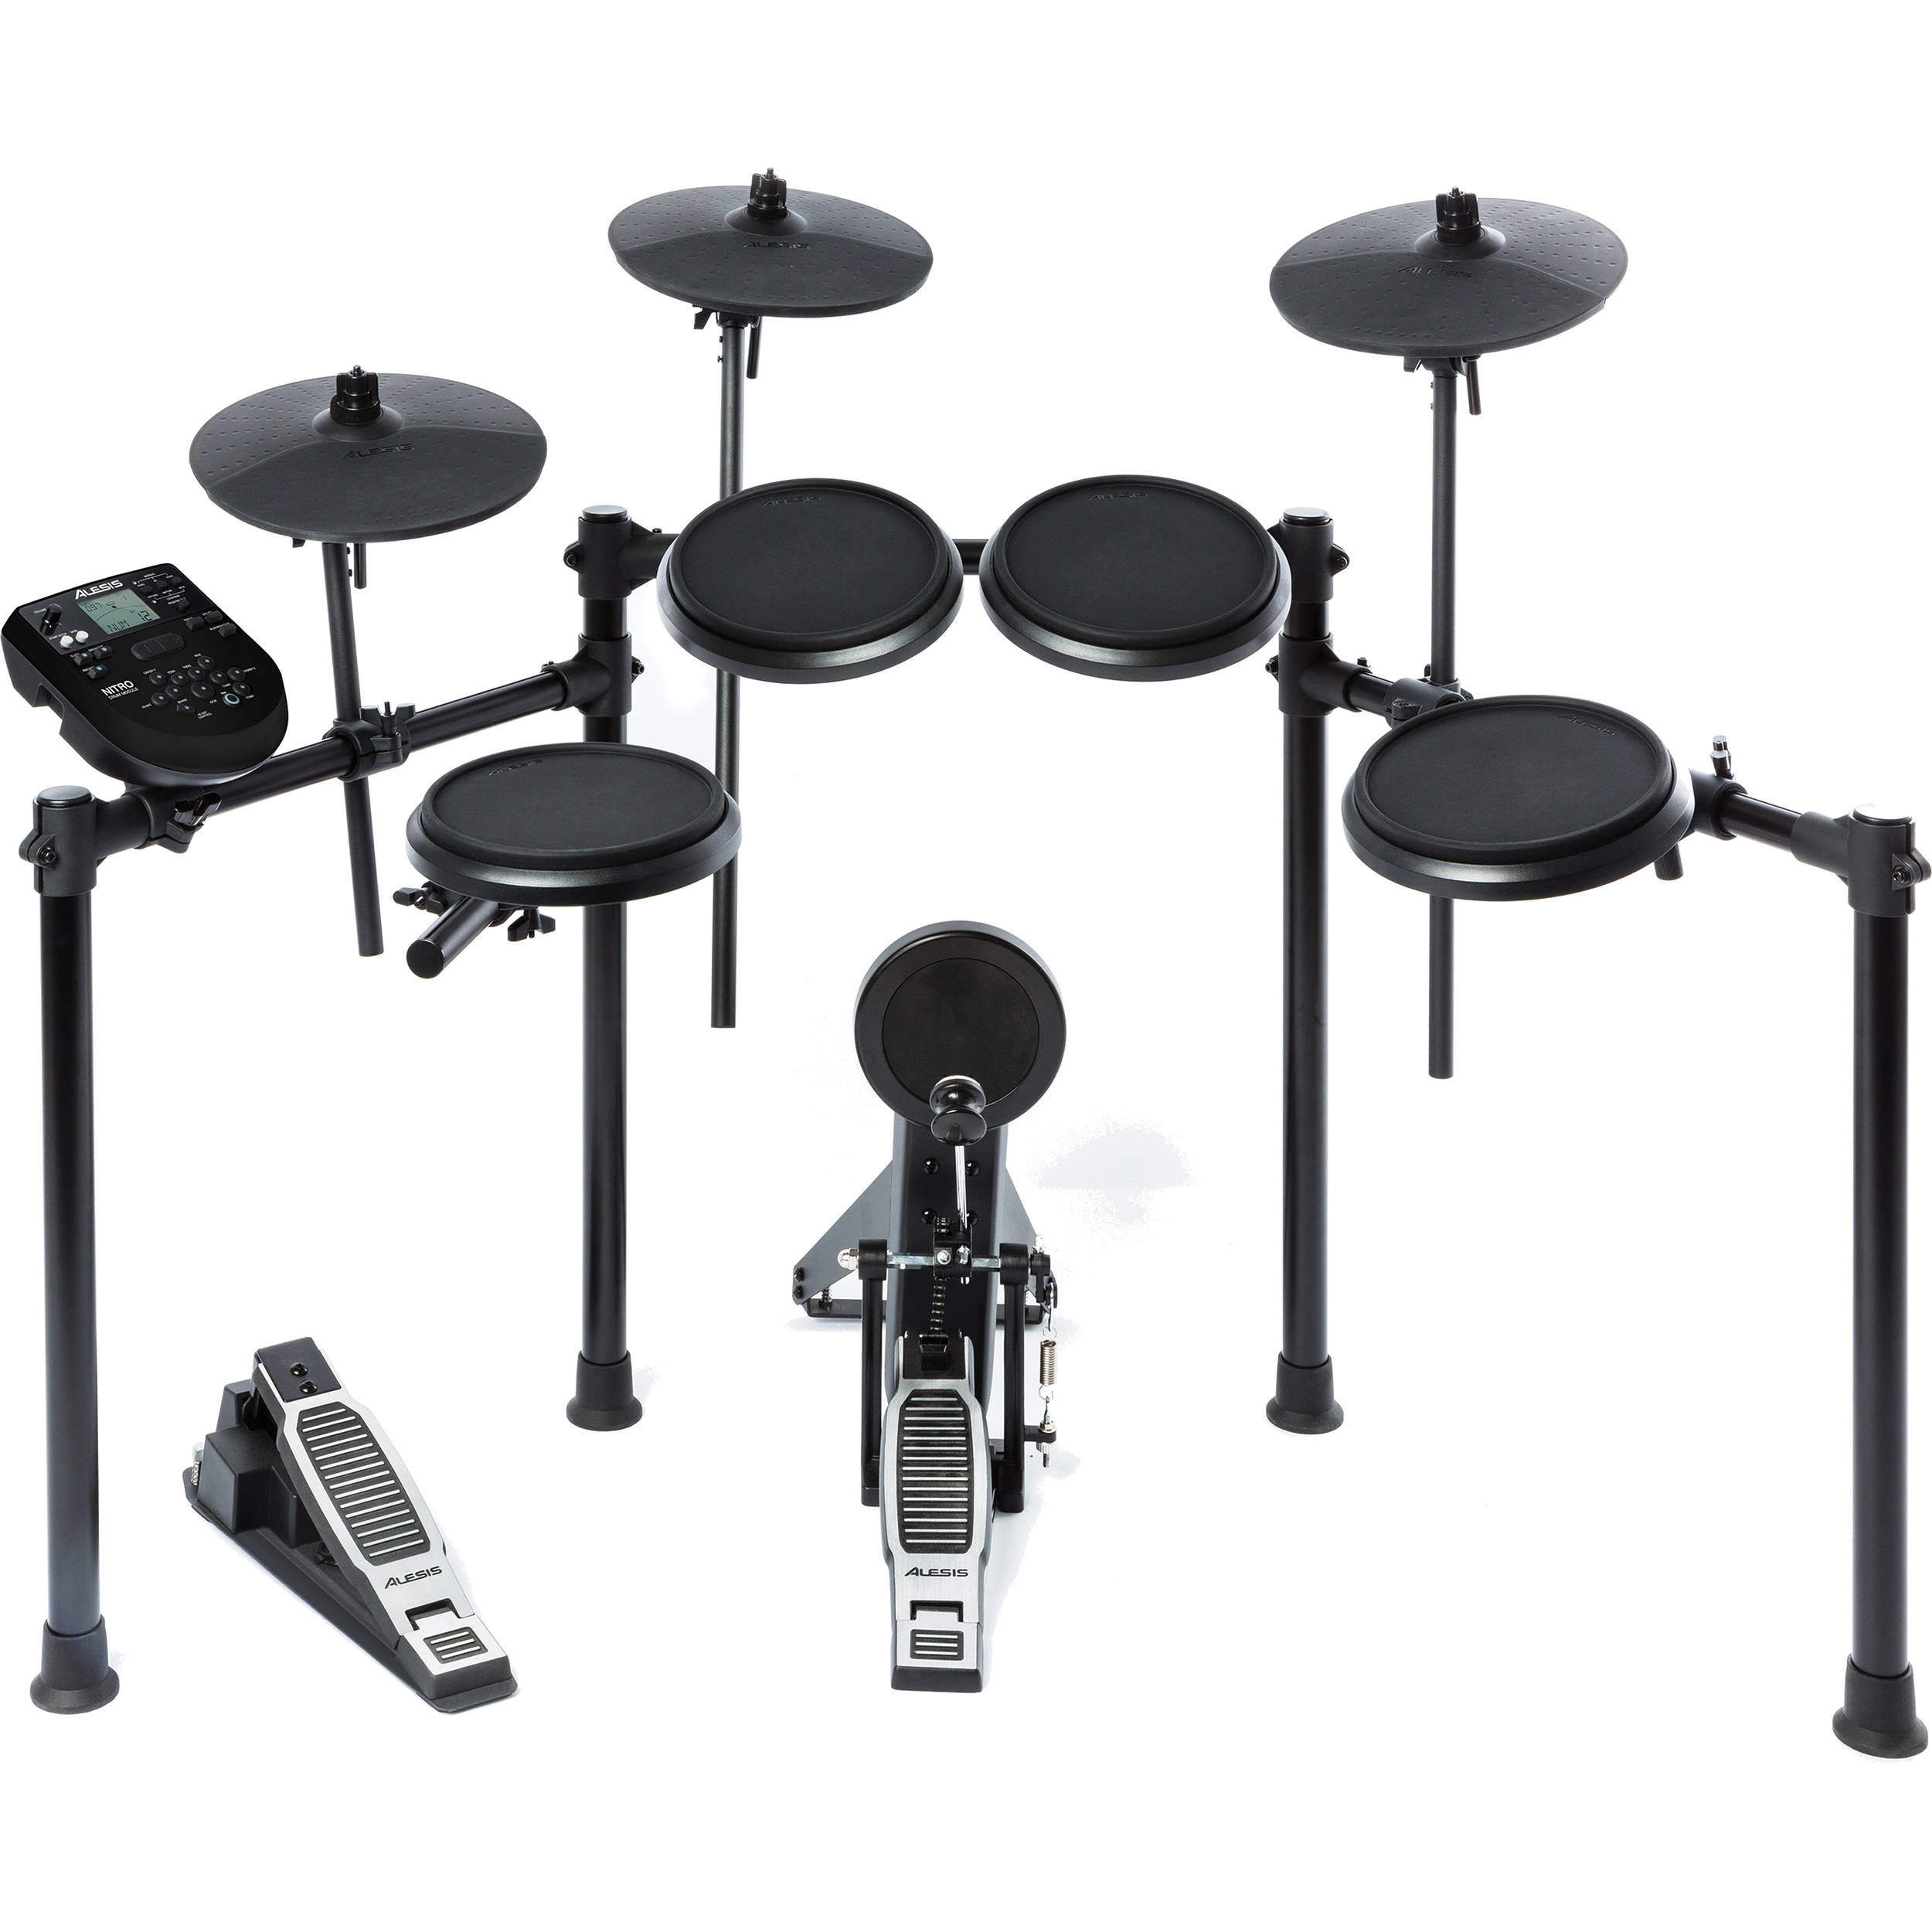 Alesis Nitro Drum Kit 8 Piece Electronic Bh Kits Hobby With Module